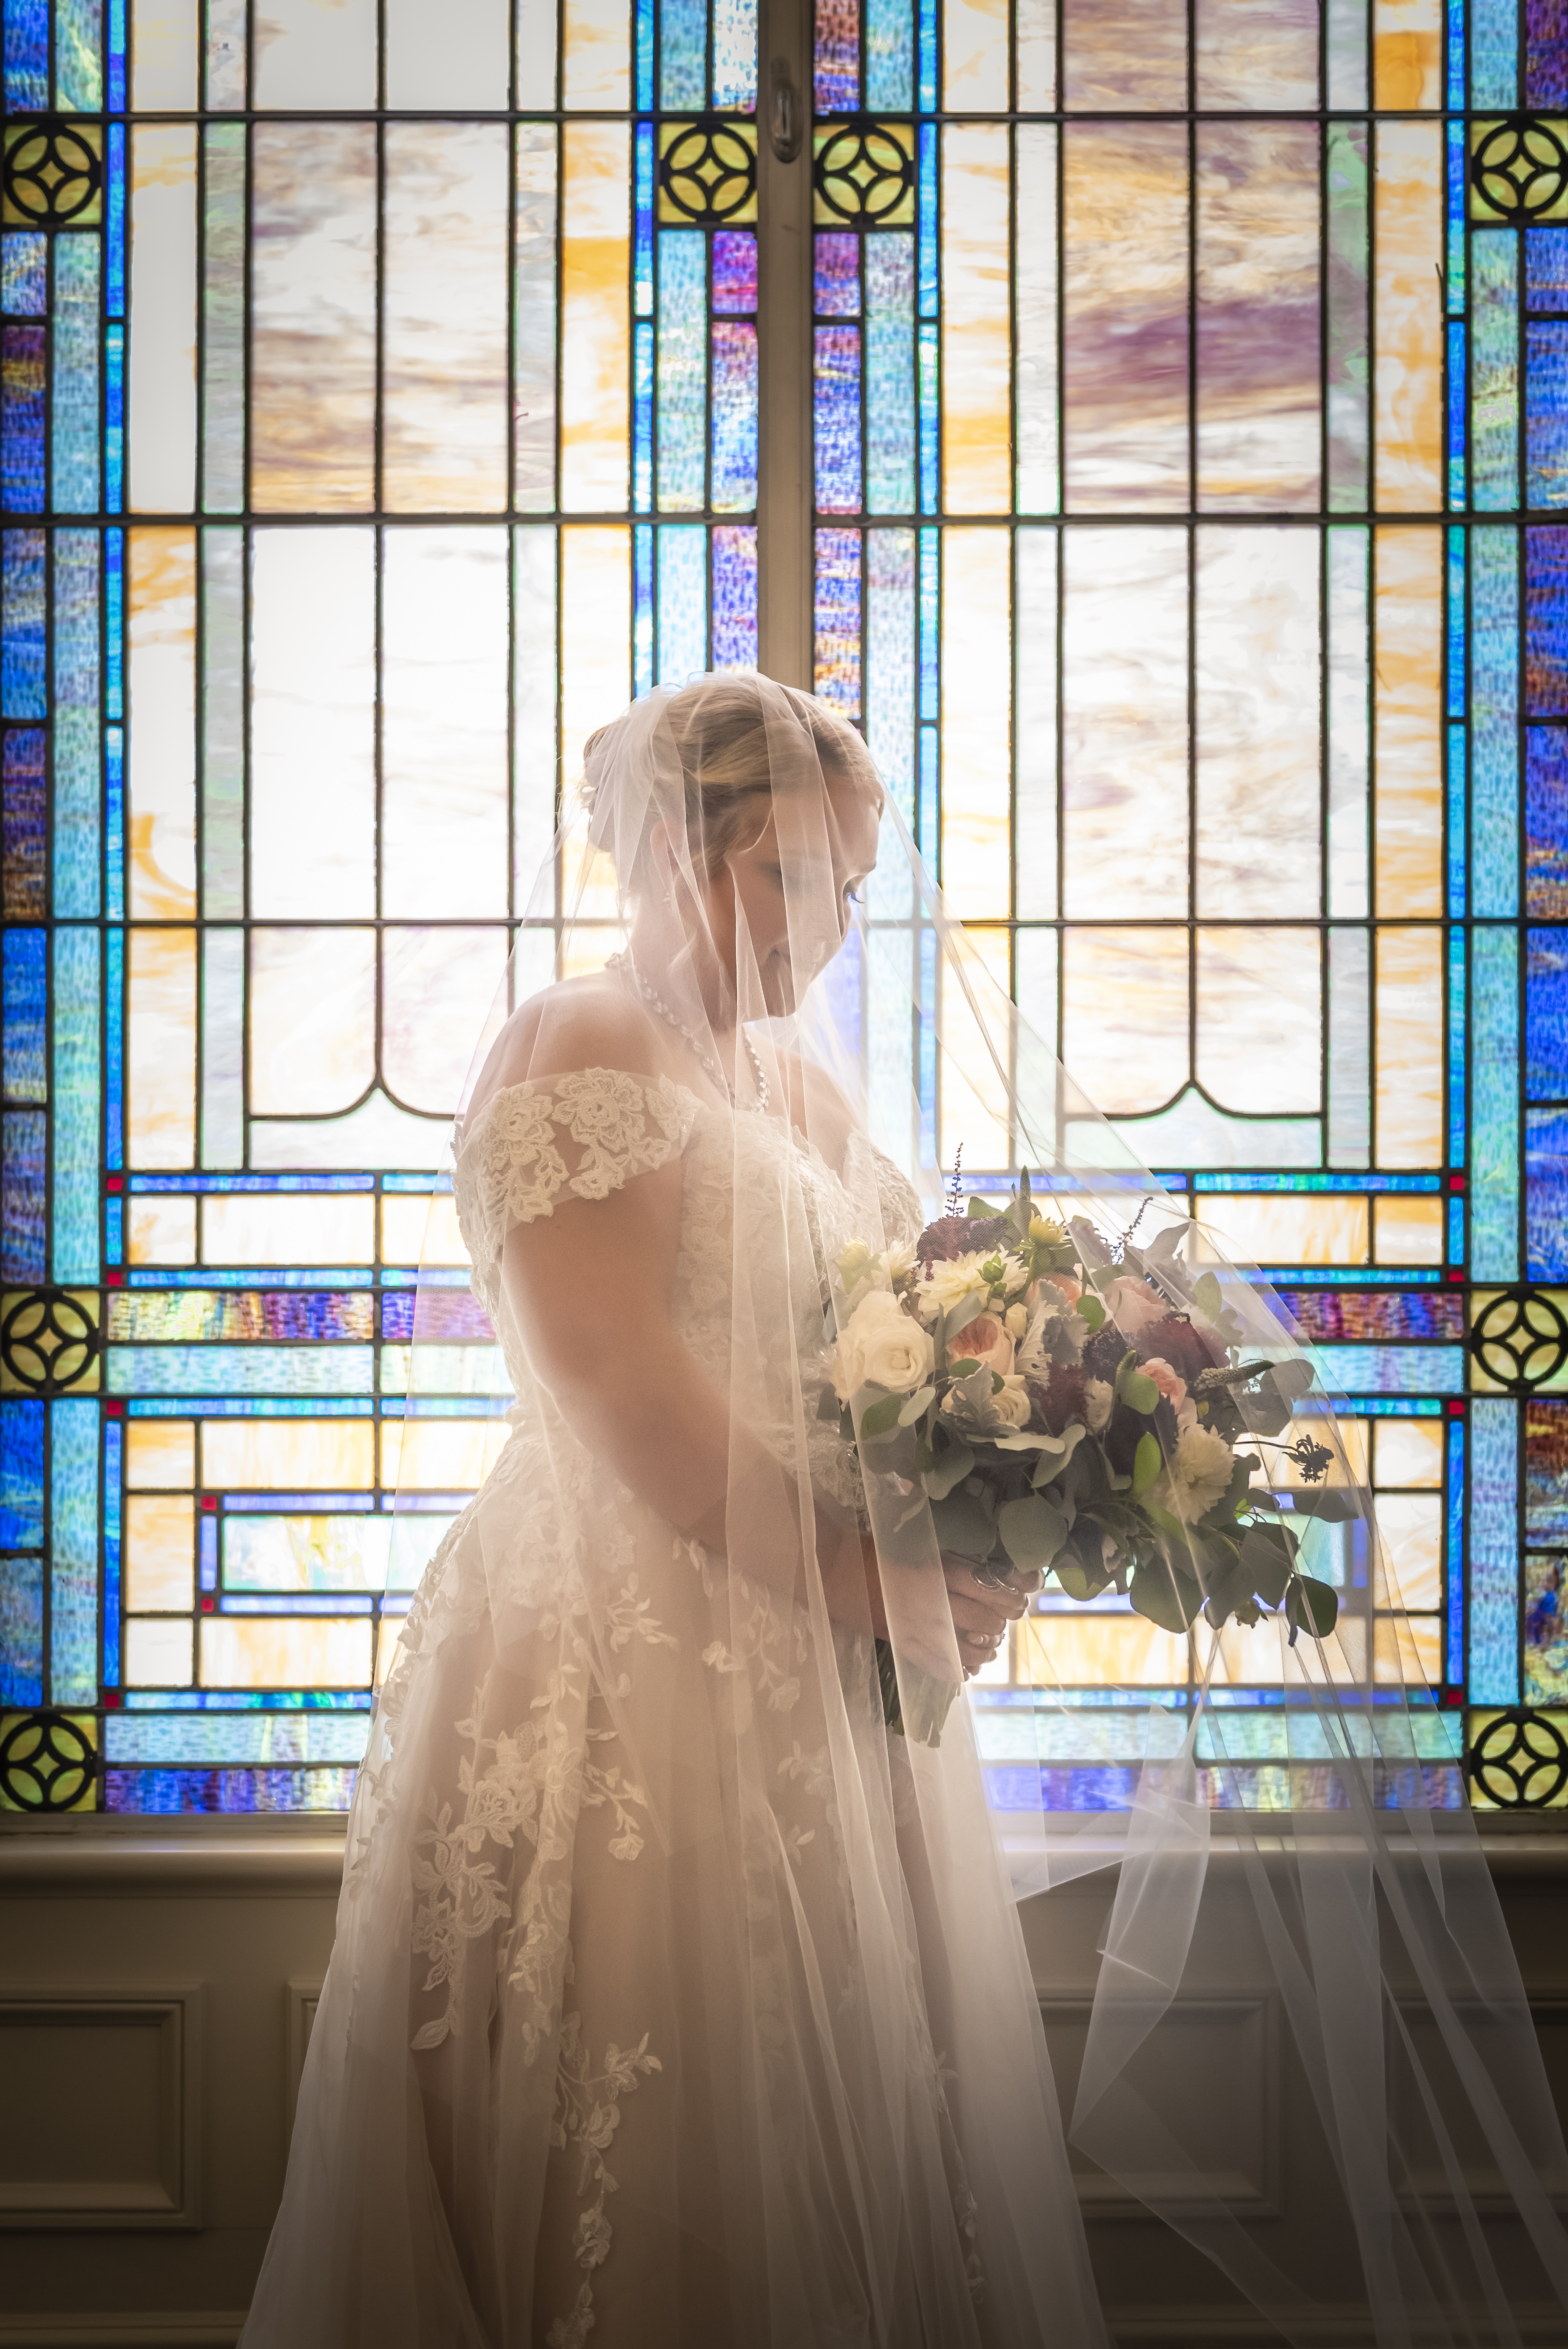 maggieandrew_wedding-6-2